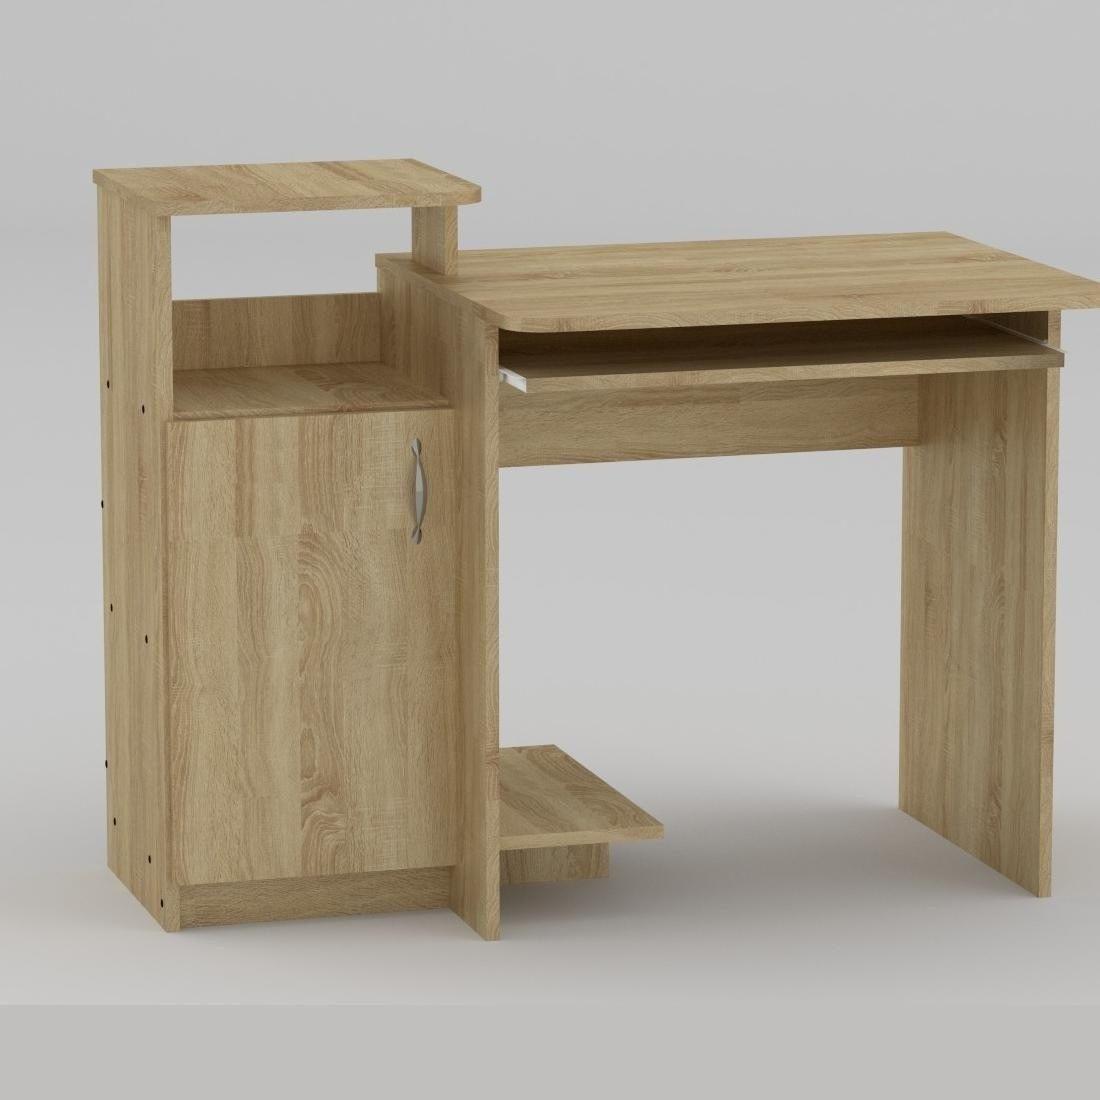 Компьютерный стол Компанит СКМ-2 1102х600х750 мм дуб сономе